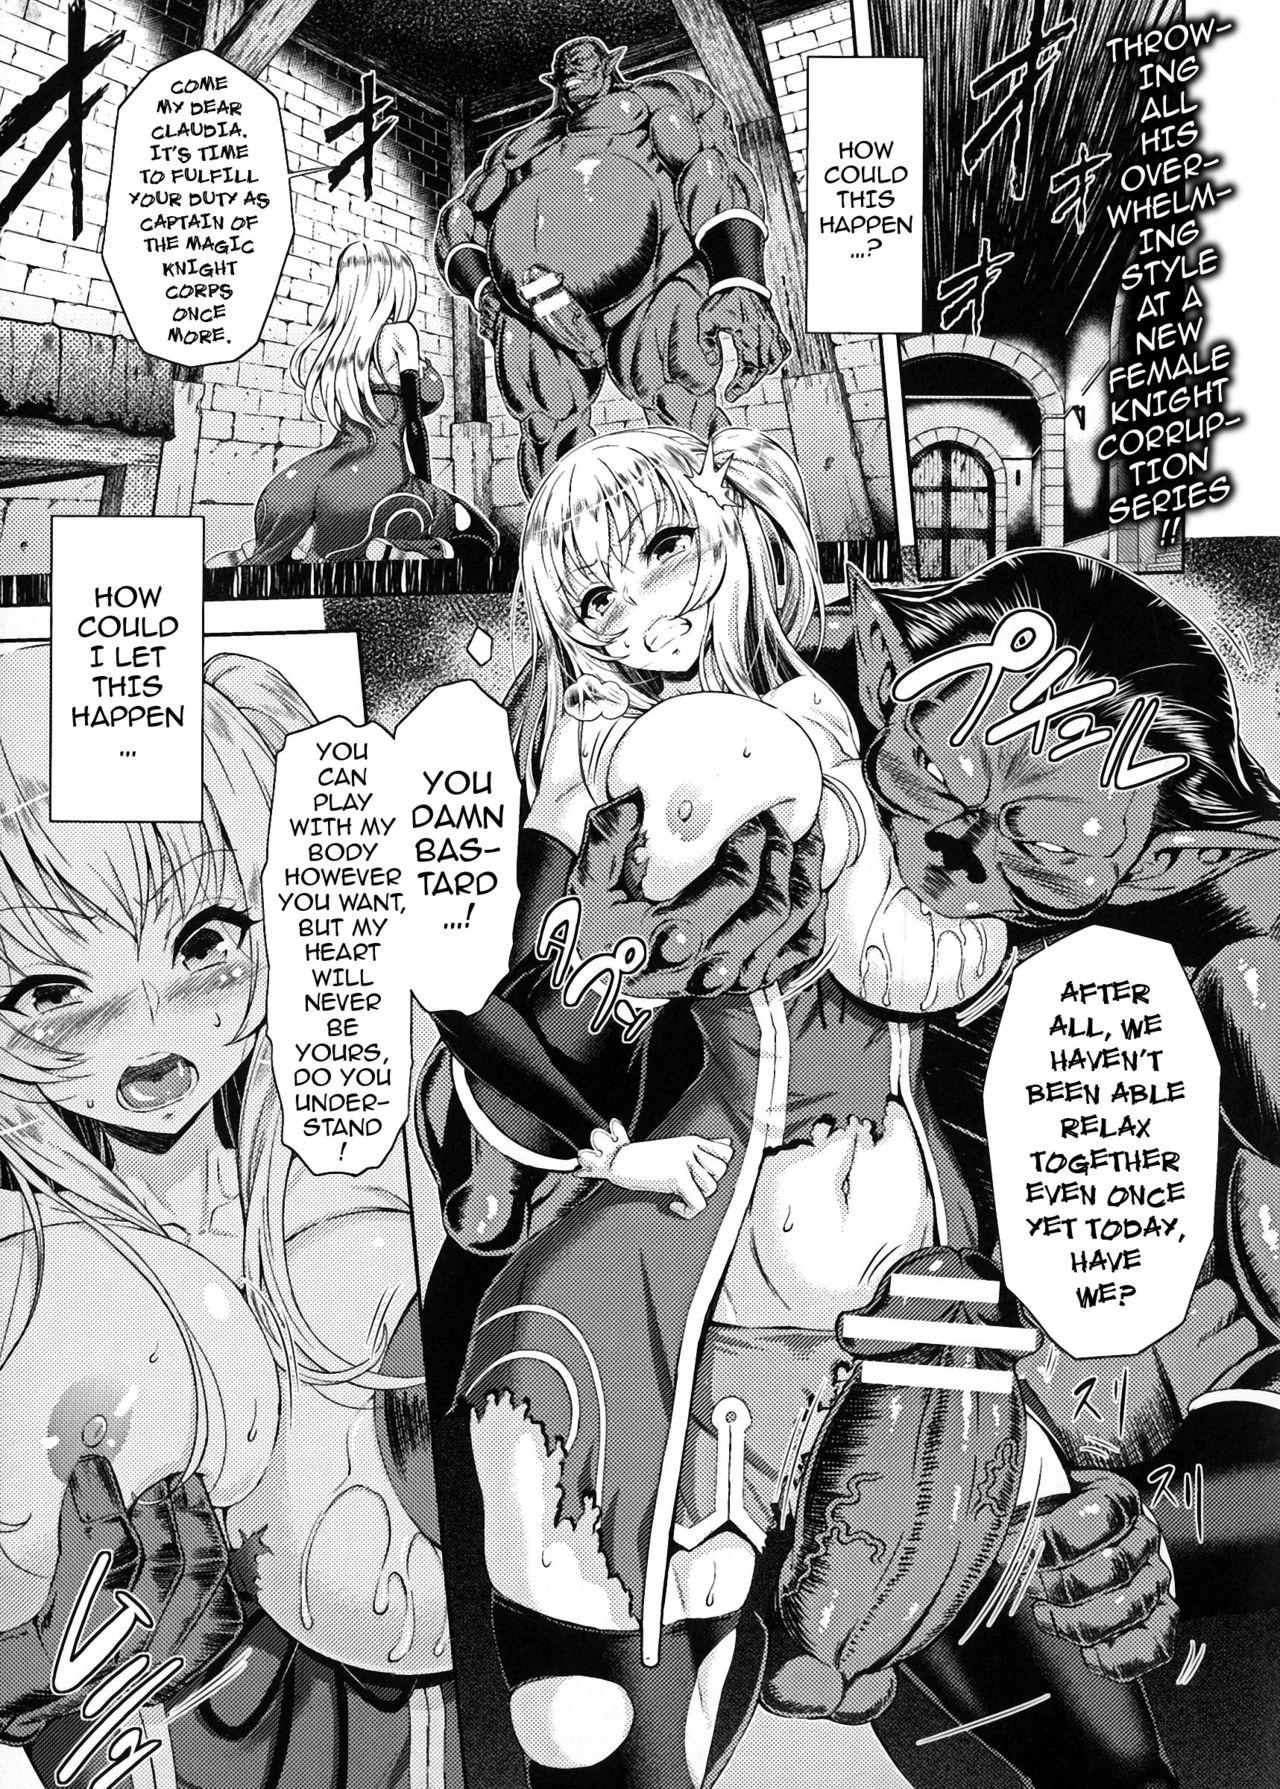 [Yamada Gogogo] Erona ~Orc no Inmon ni Okasareta Onna Kishi no Matsuro~   Erona ~The Fall of a Beautiful Knight Cursed with the Lewd Mark of an Orc~ Ch. 1-6 [English] {darknight} 1